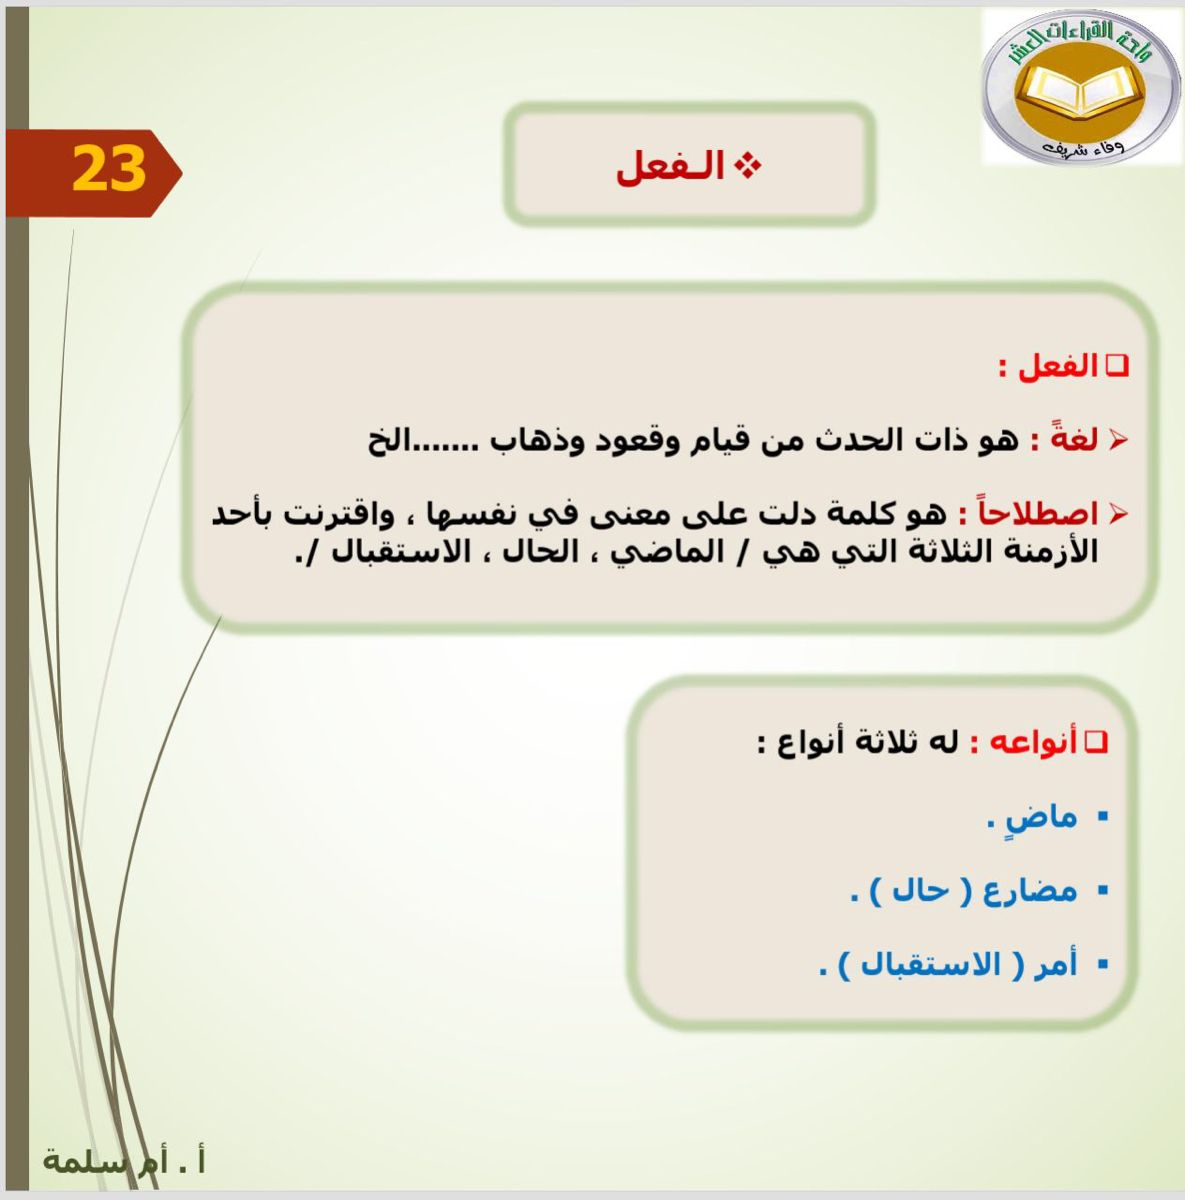 Pin By Hany Elbasha On فوائد نحوي ة Arabic Langauge Oxi Map